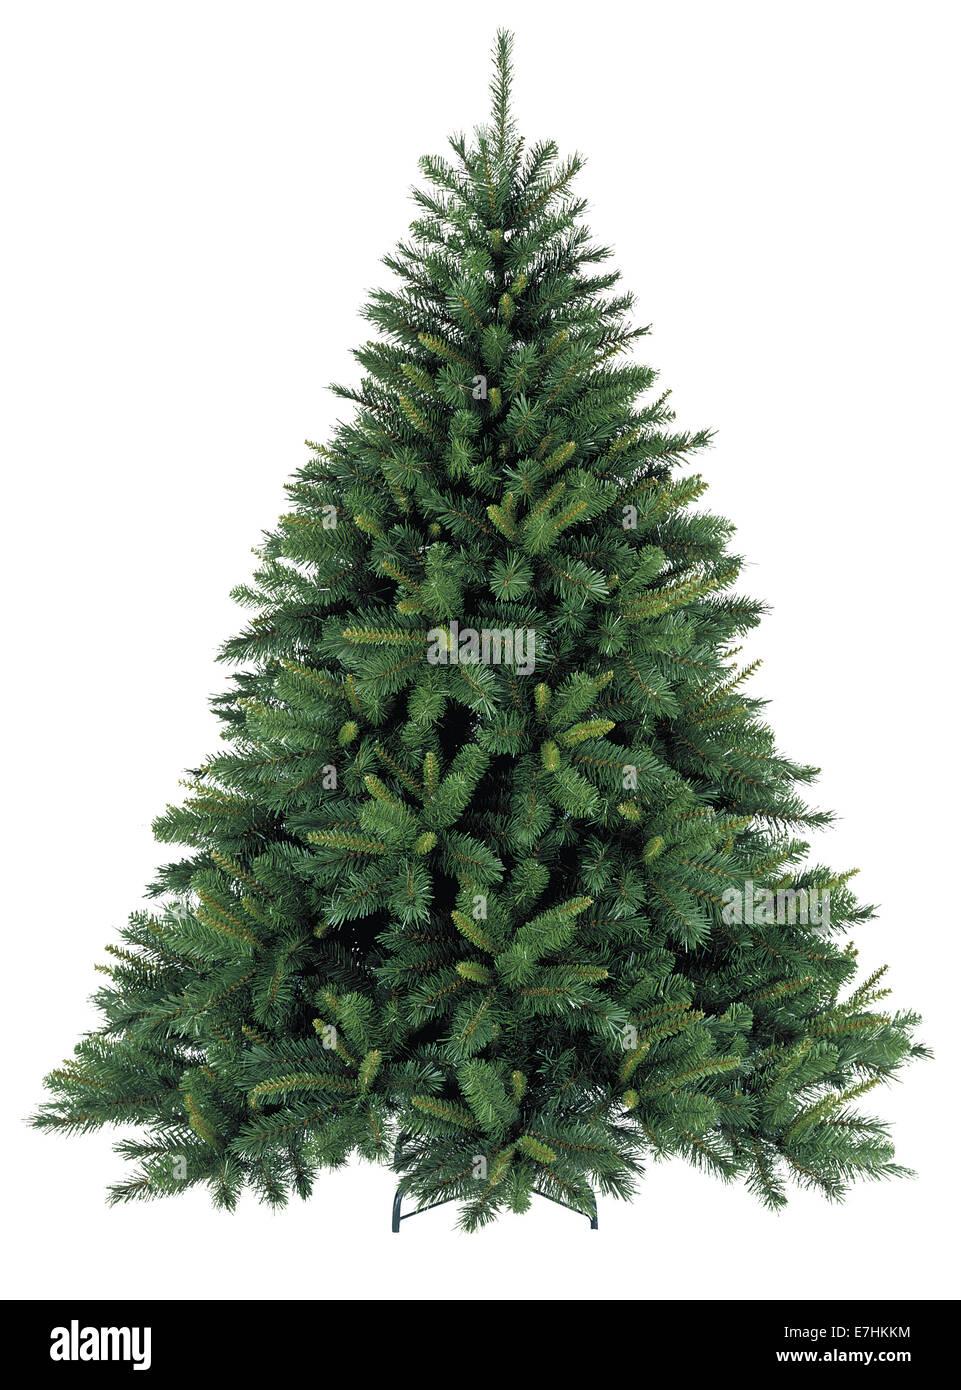 Bare Christmas tree Stock Photo: 73532696 - Alamy